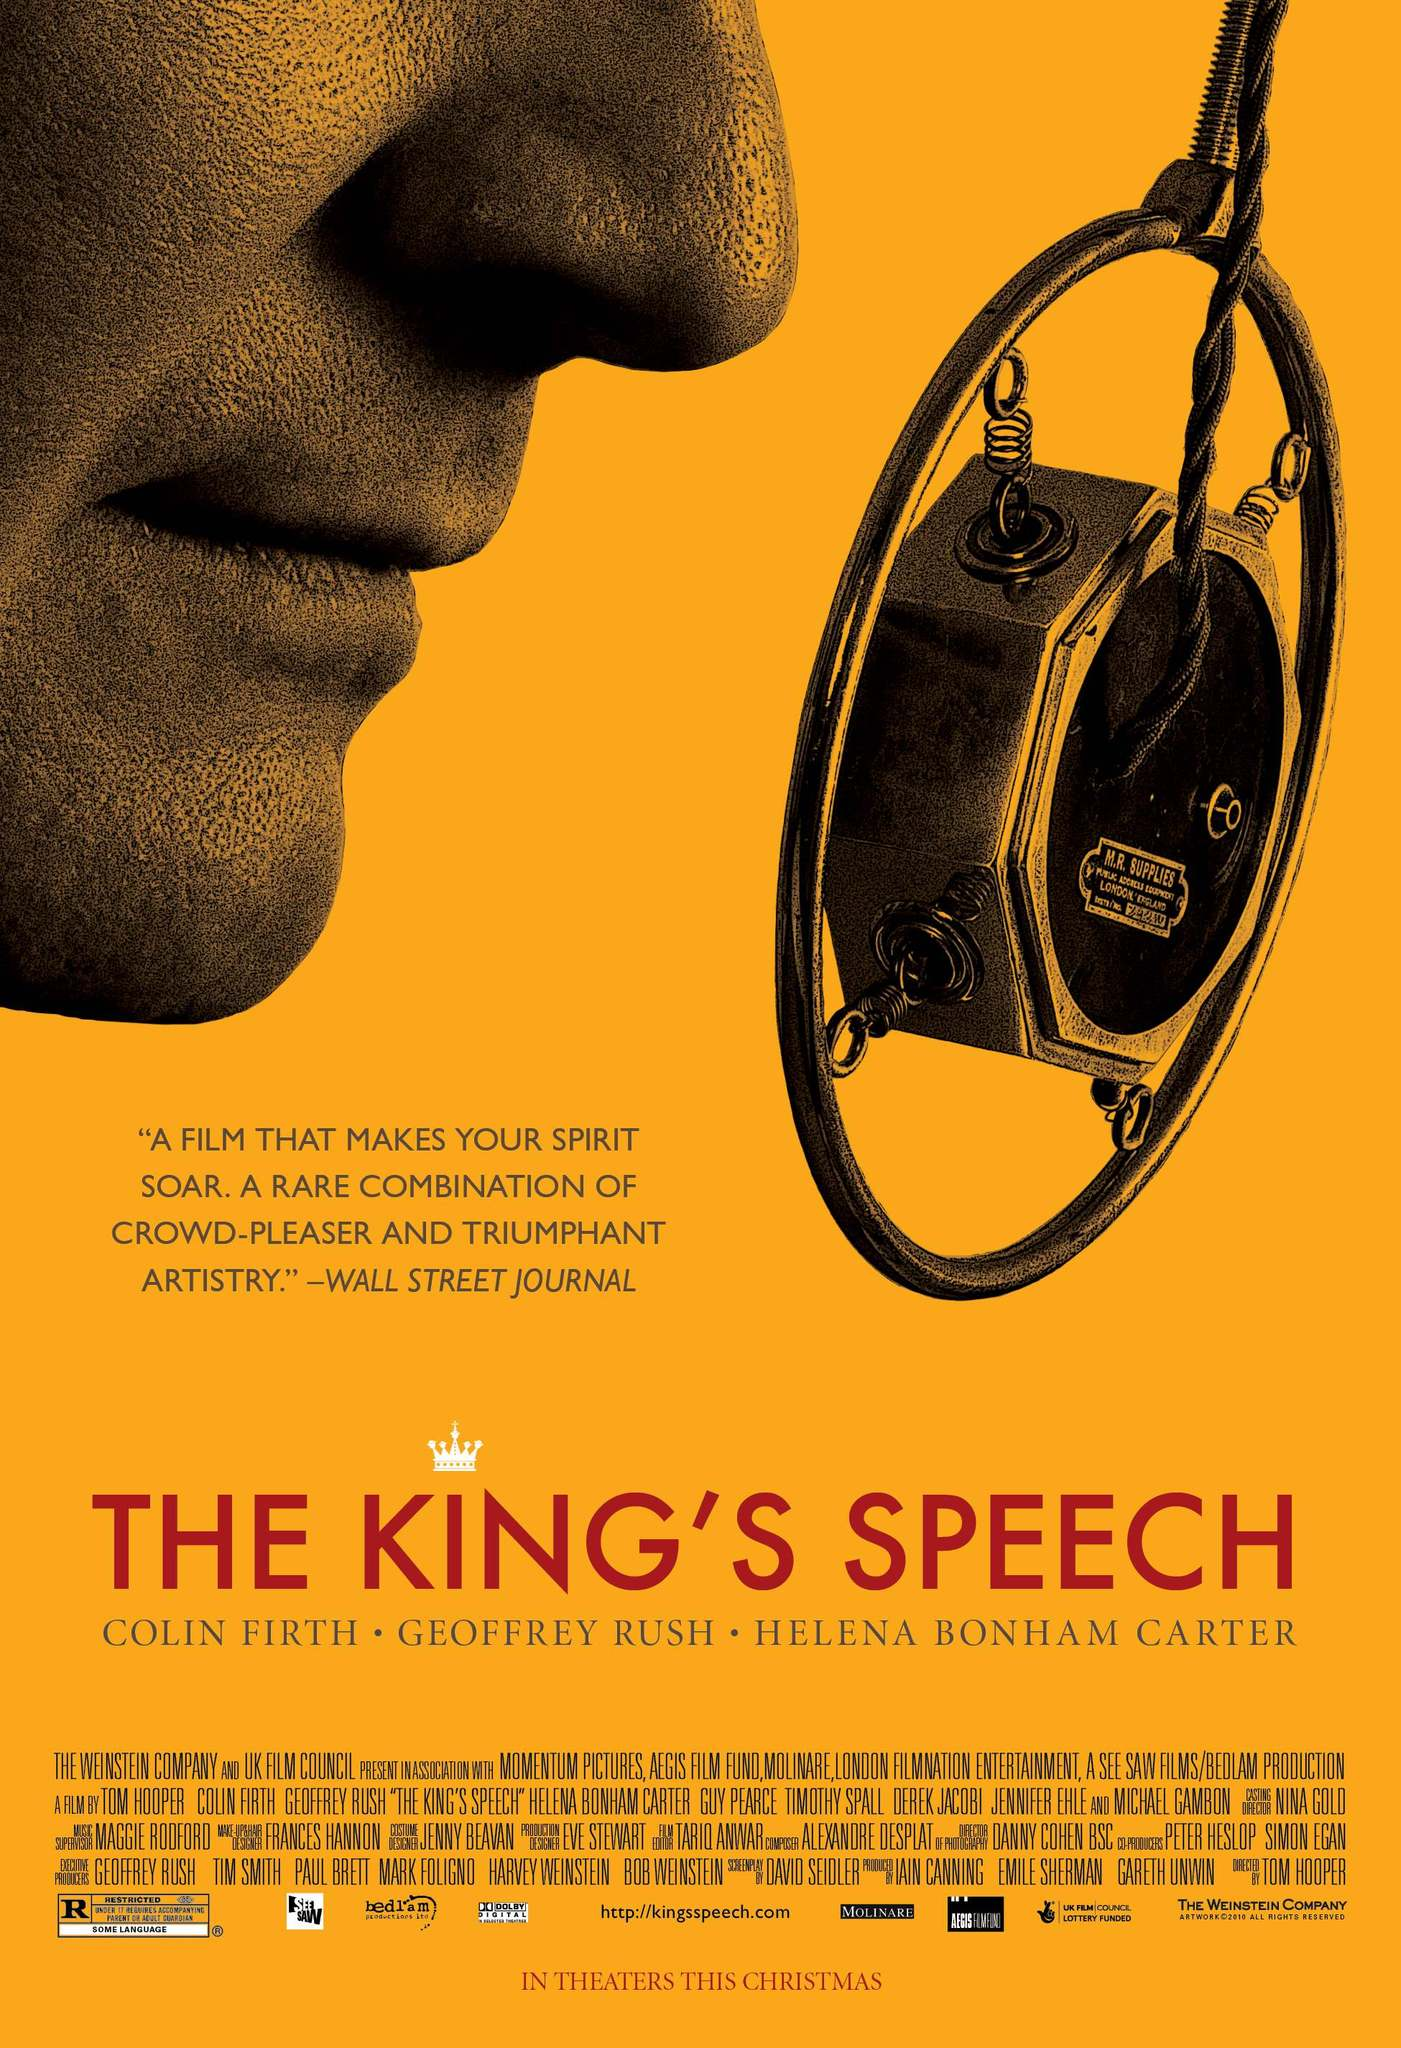 The King's Speech Air-Edel